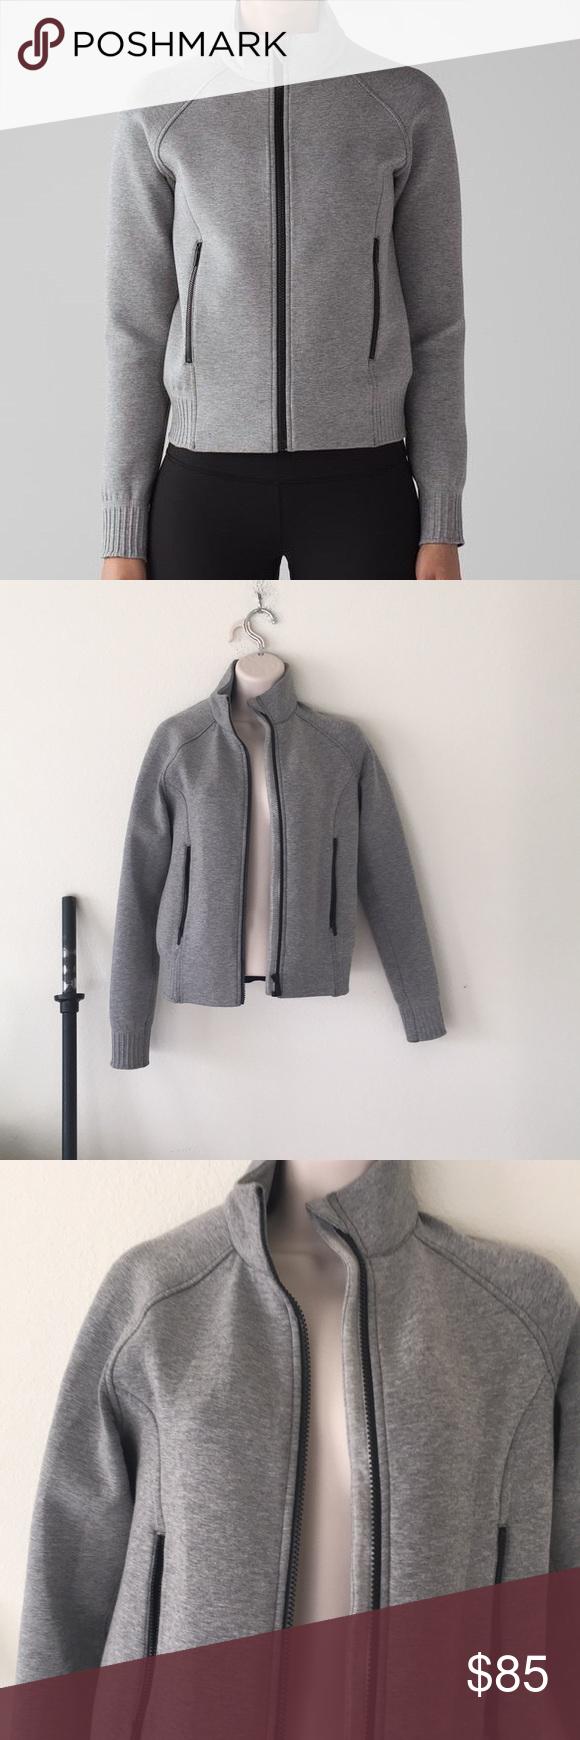 039f98f75 Lululemon gray bomber jacket nts jacket size 4 Great condition. Worn ...